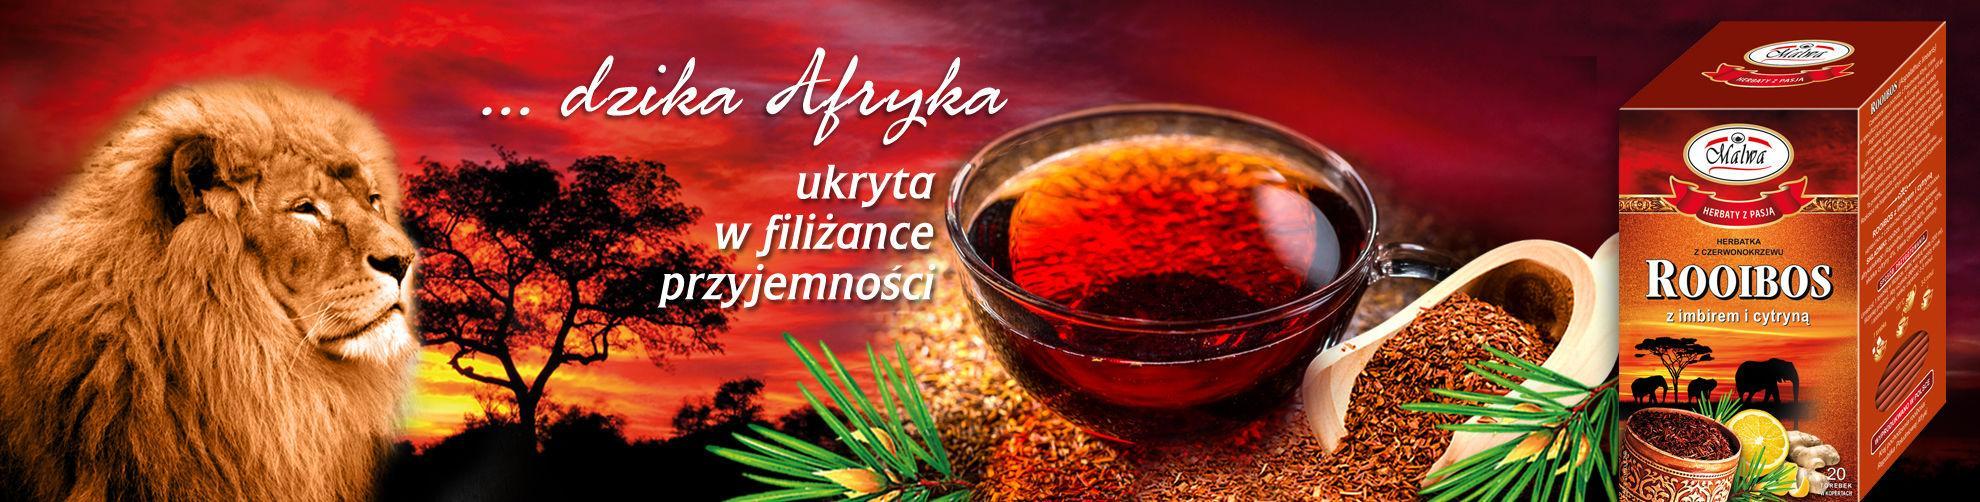 Malwa Tea - Herbaty ROOIBOS